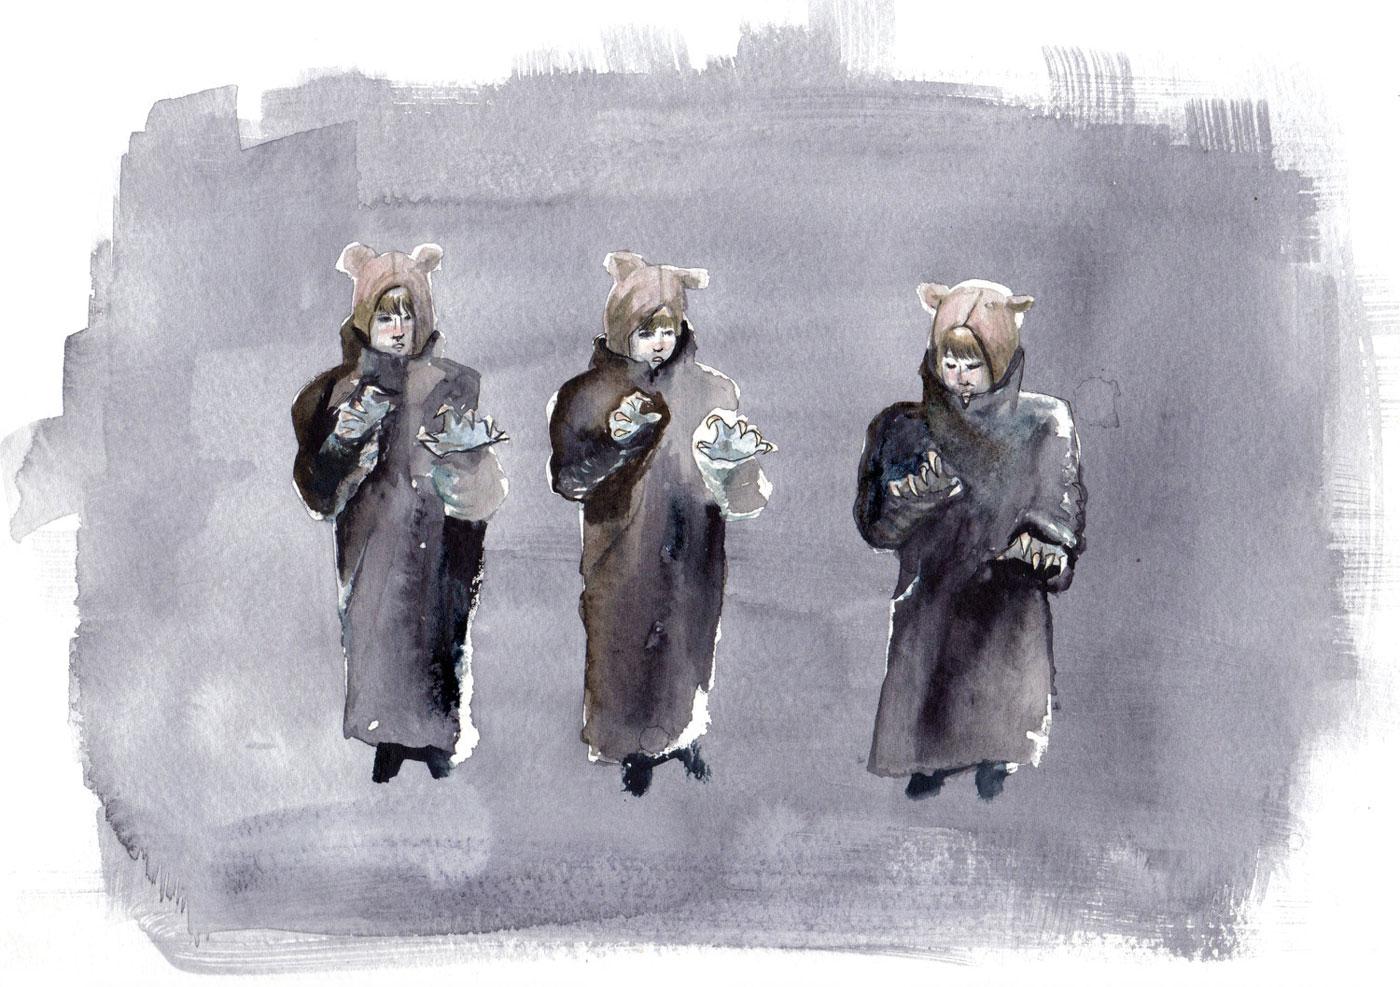 cora-marcora-marinoff-personal-work-painting-three-bears-siblings-series-1